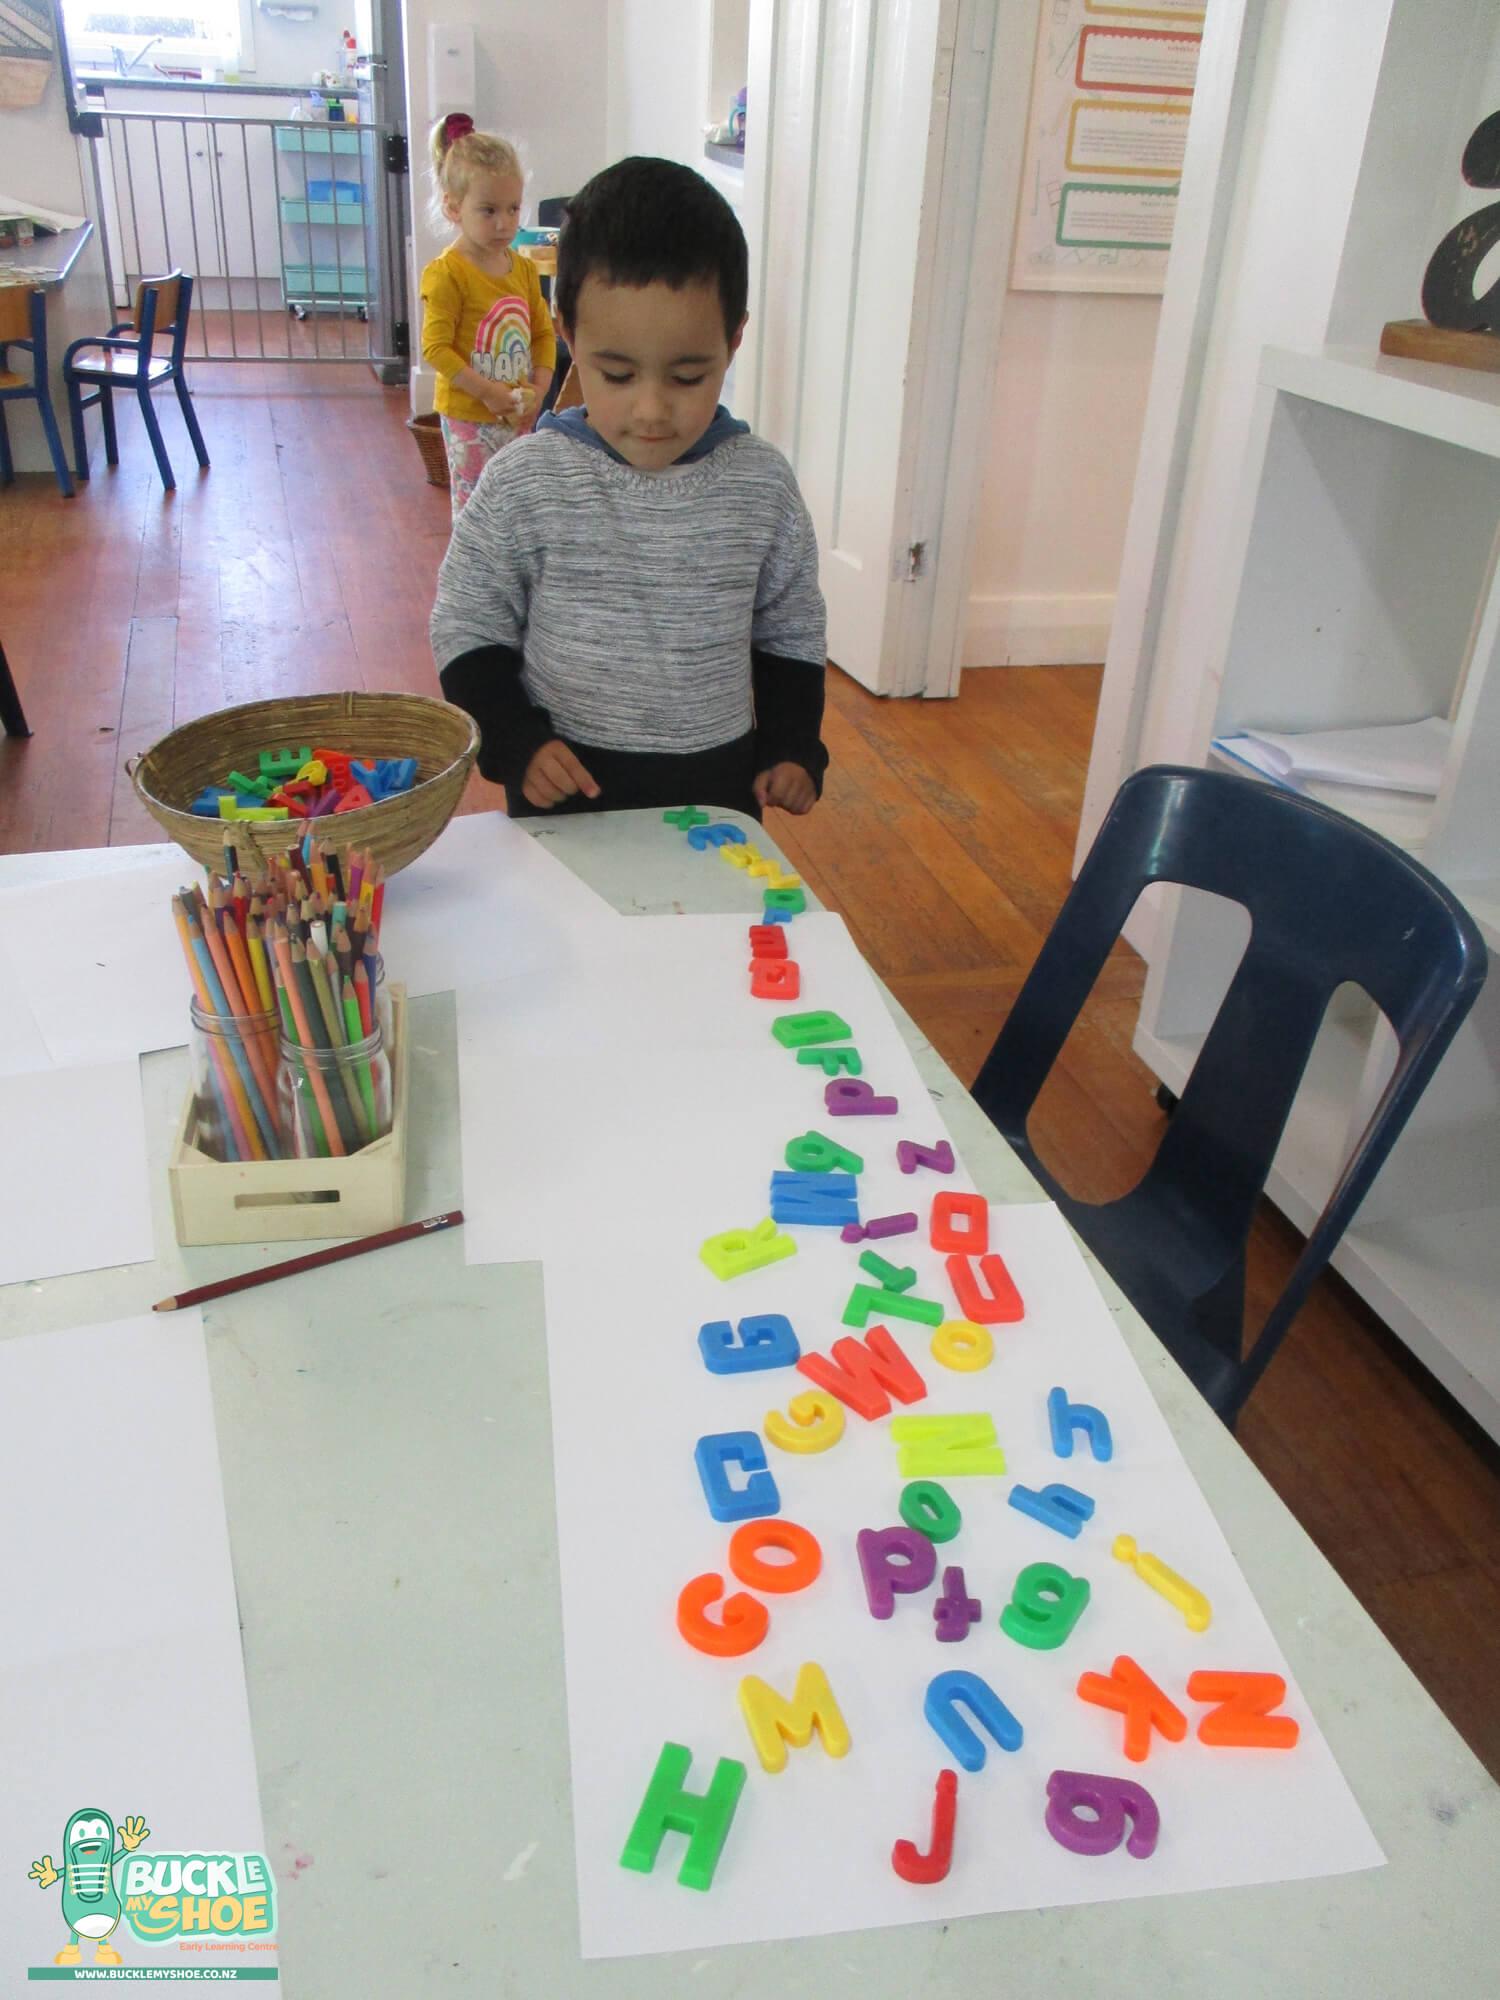 Buckle-my-shoe-childcare-preschool-tauranga-literacy-6.jpg